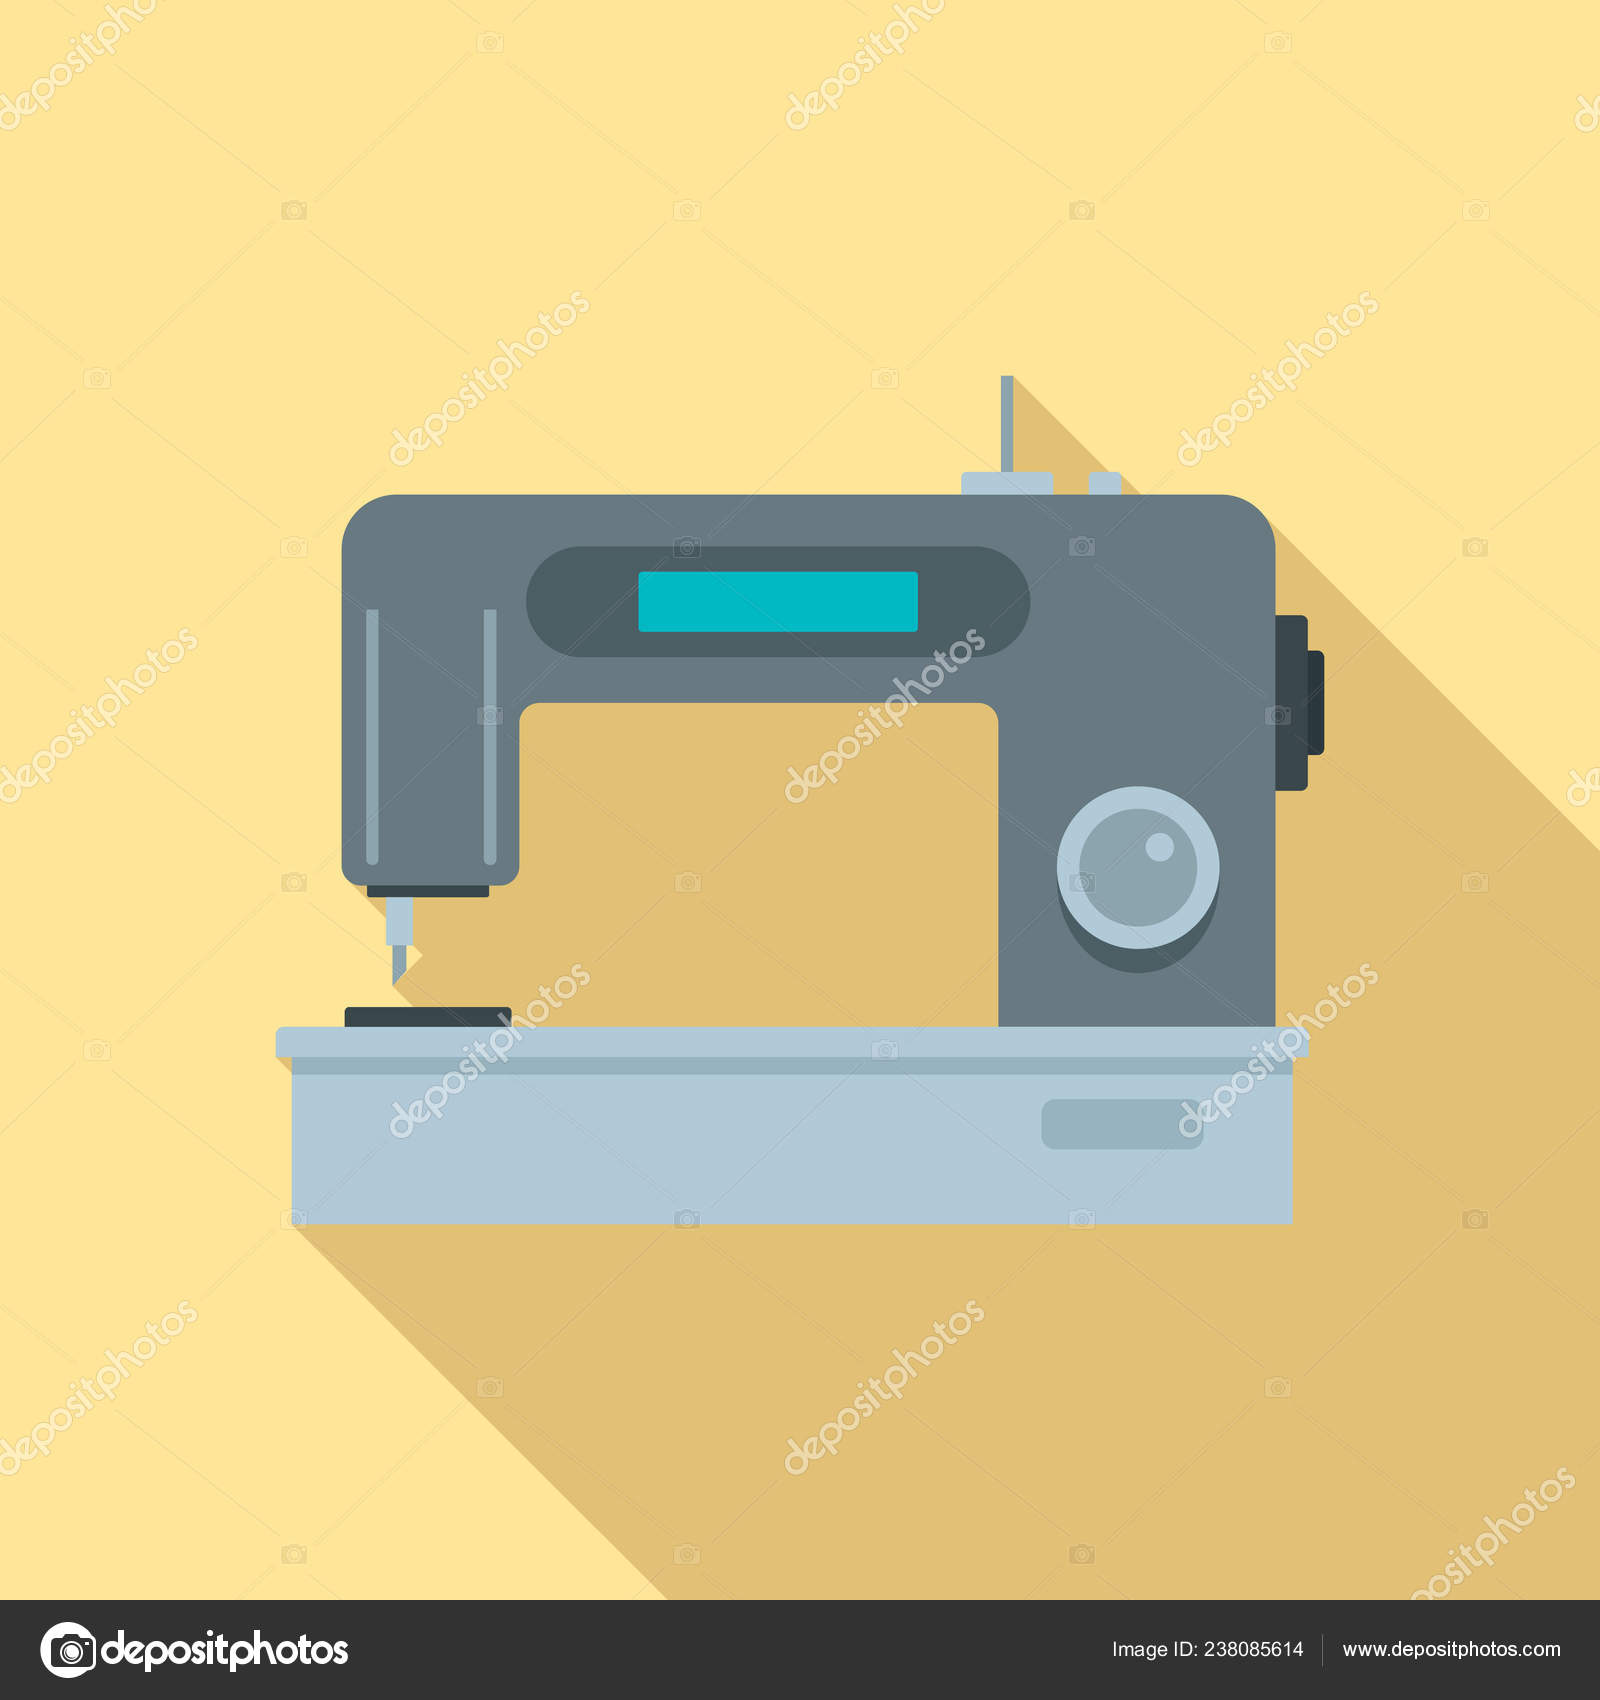 depositphotos 238085614 stock illustration digital modern sew machine icon